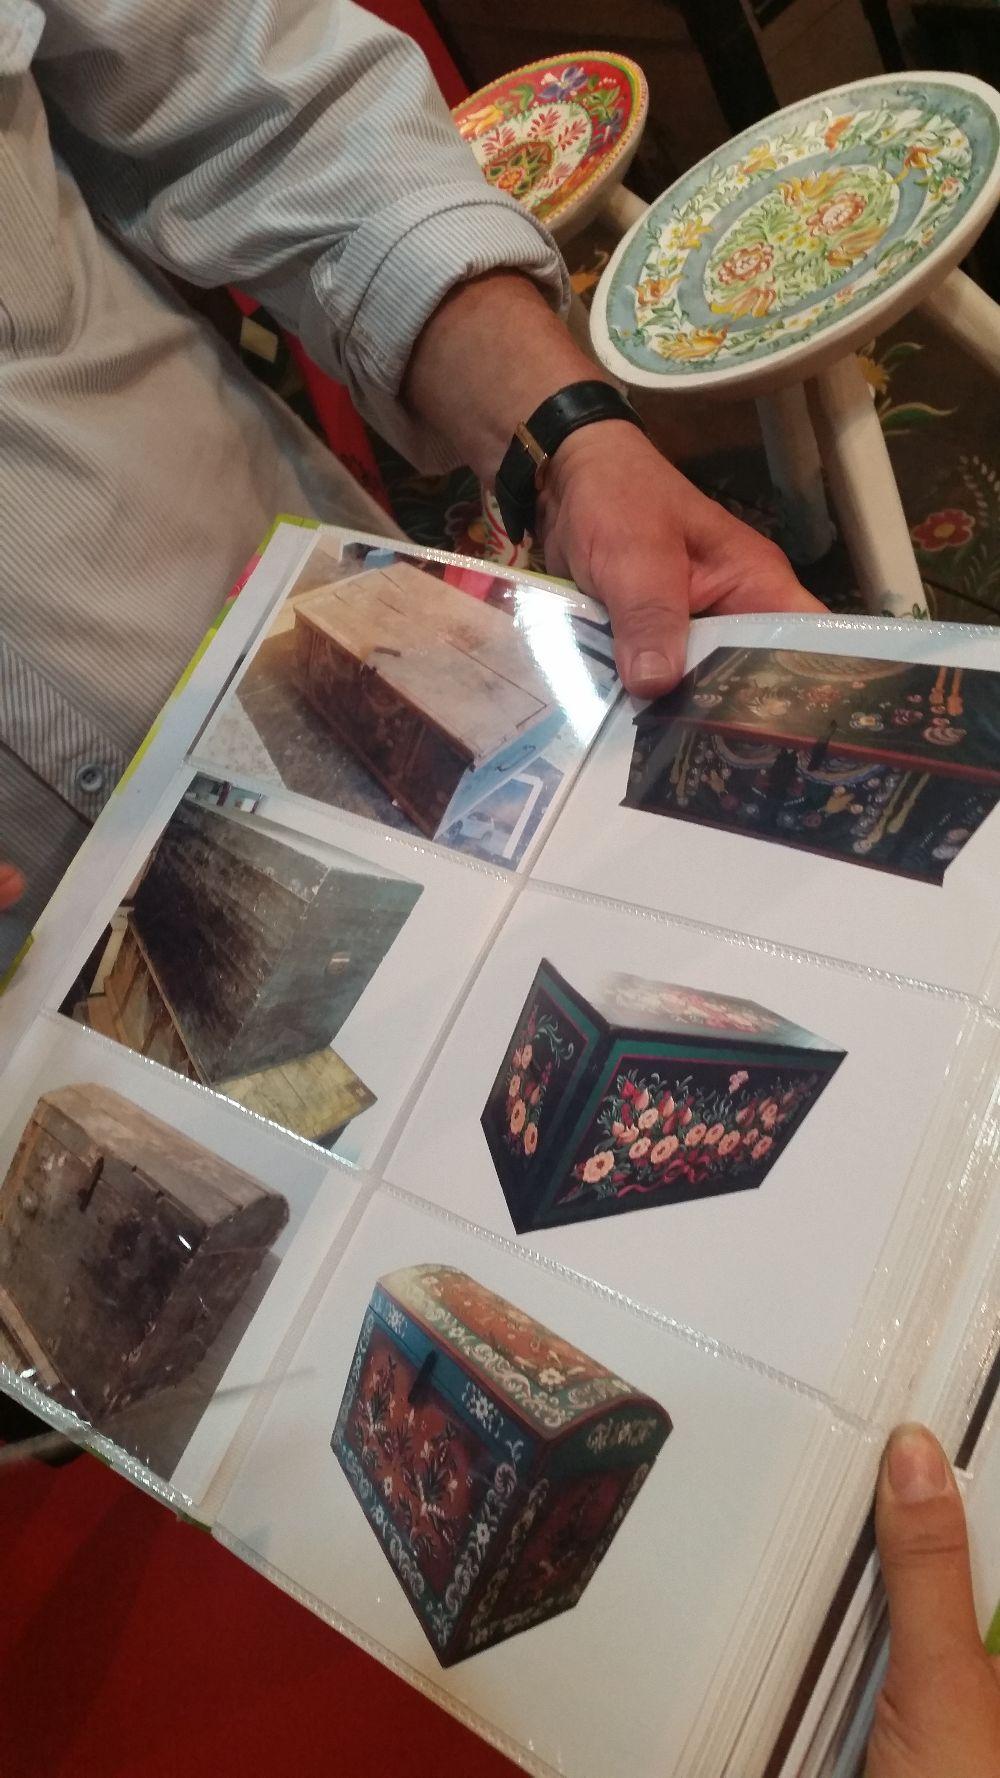 adelaparvu.com despre lazi de zestre si cufere pictate, Decofurniture (5)